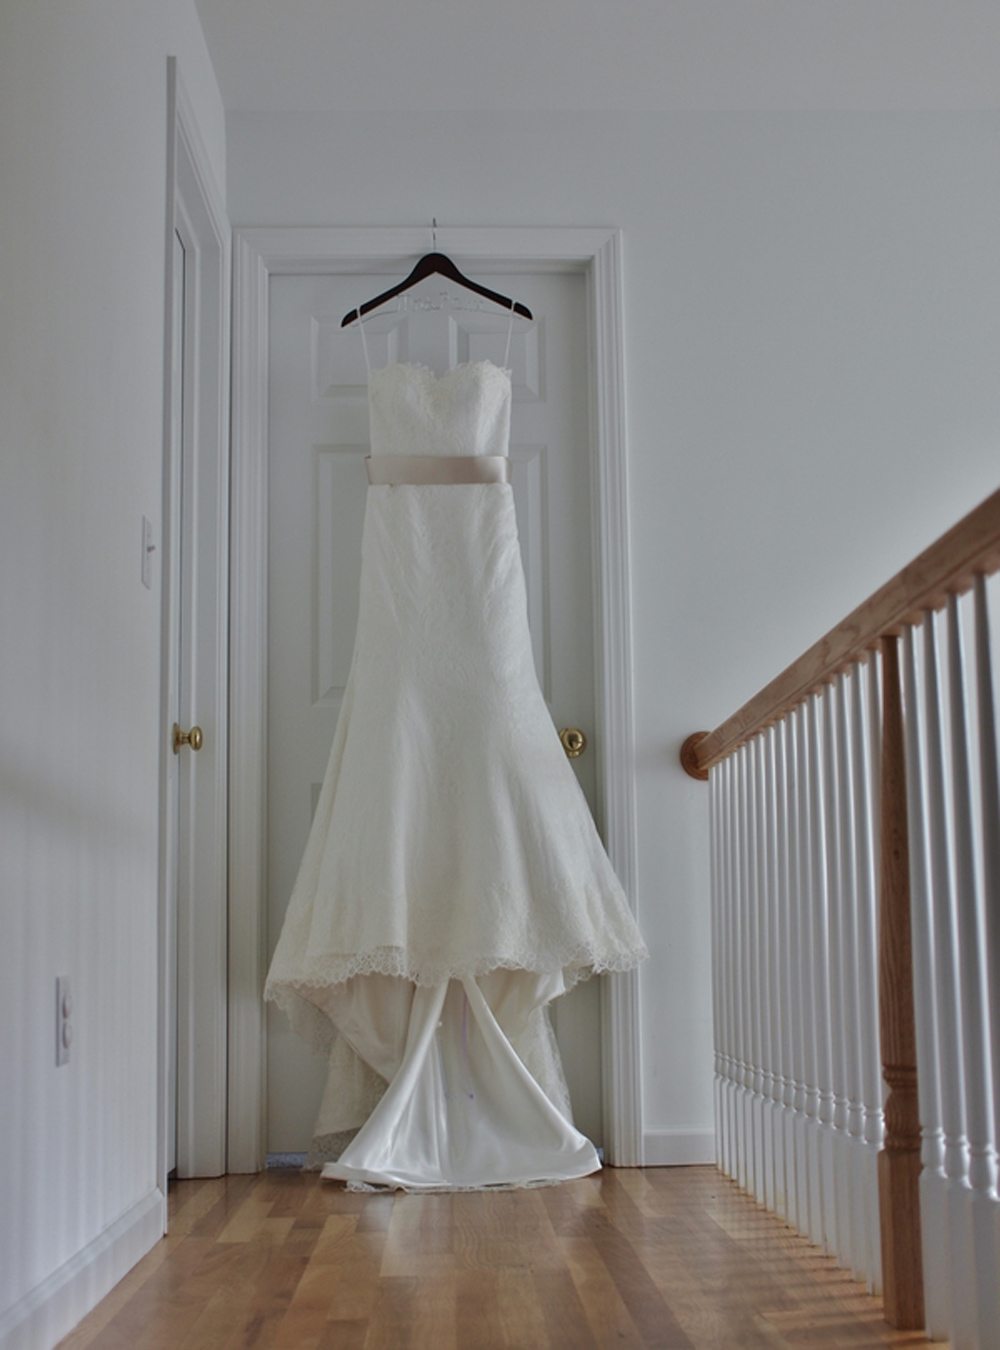 Savvy Deets Bridal A Romantic Shabby Chic Wedding at Second Chance Farm